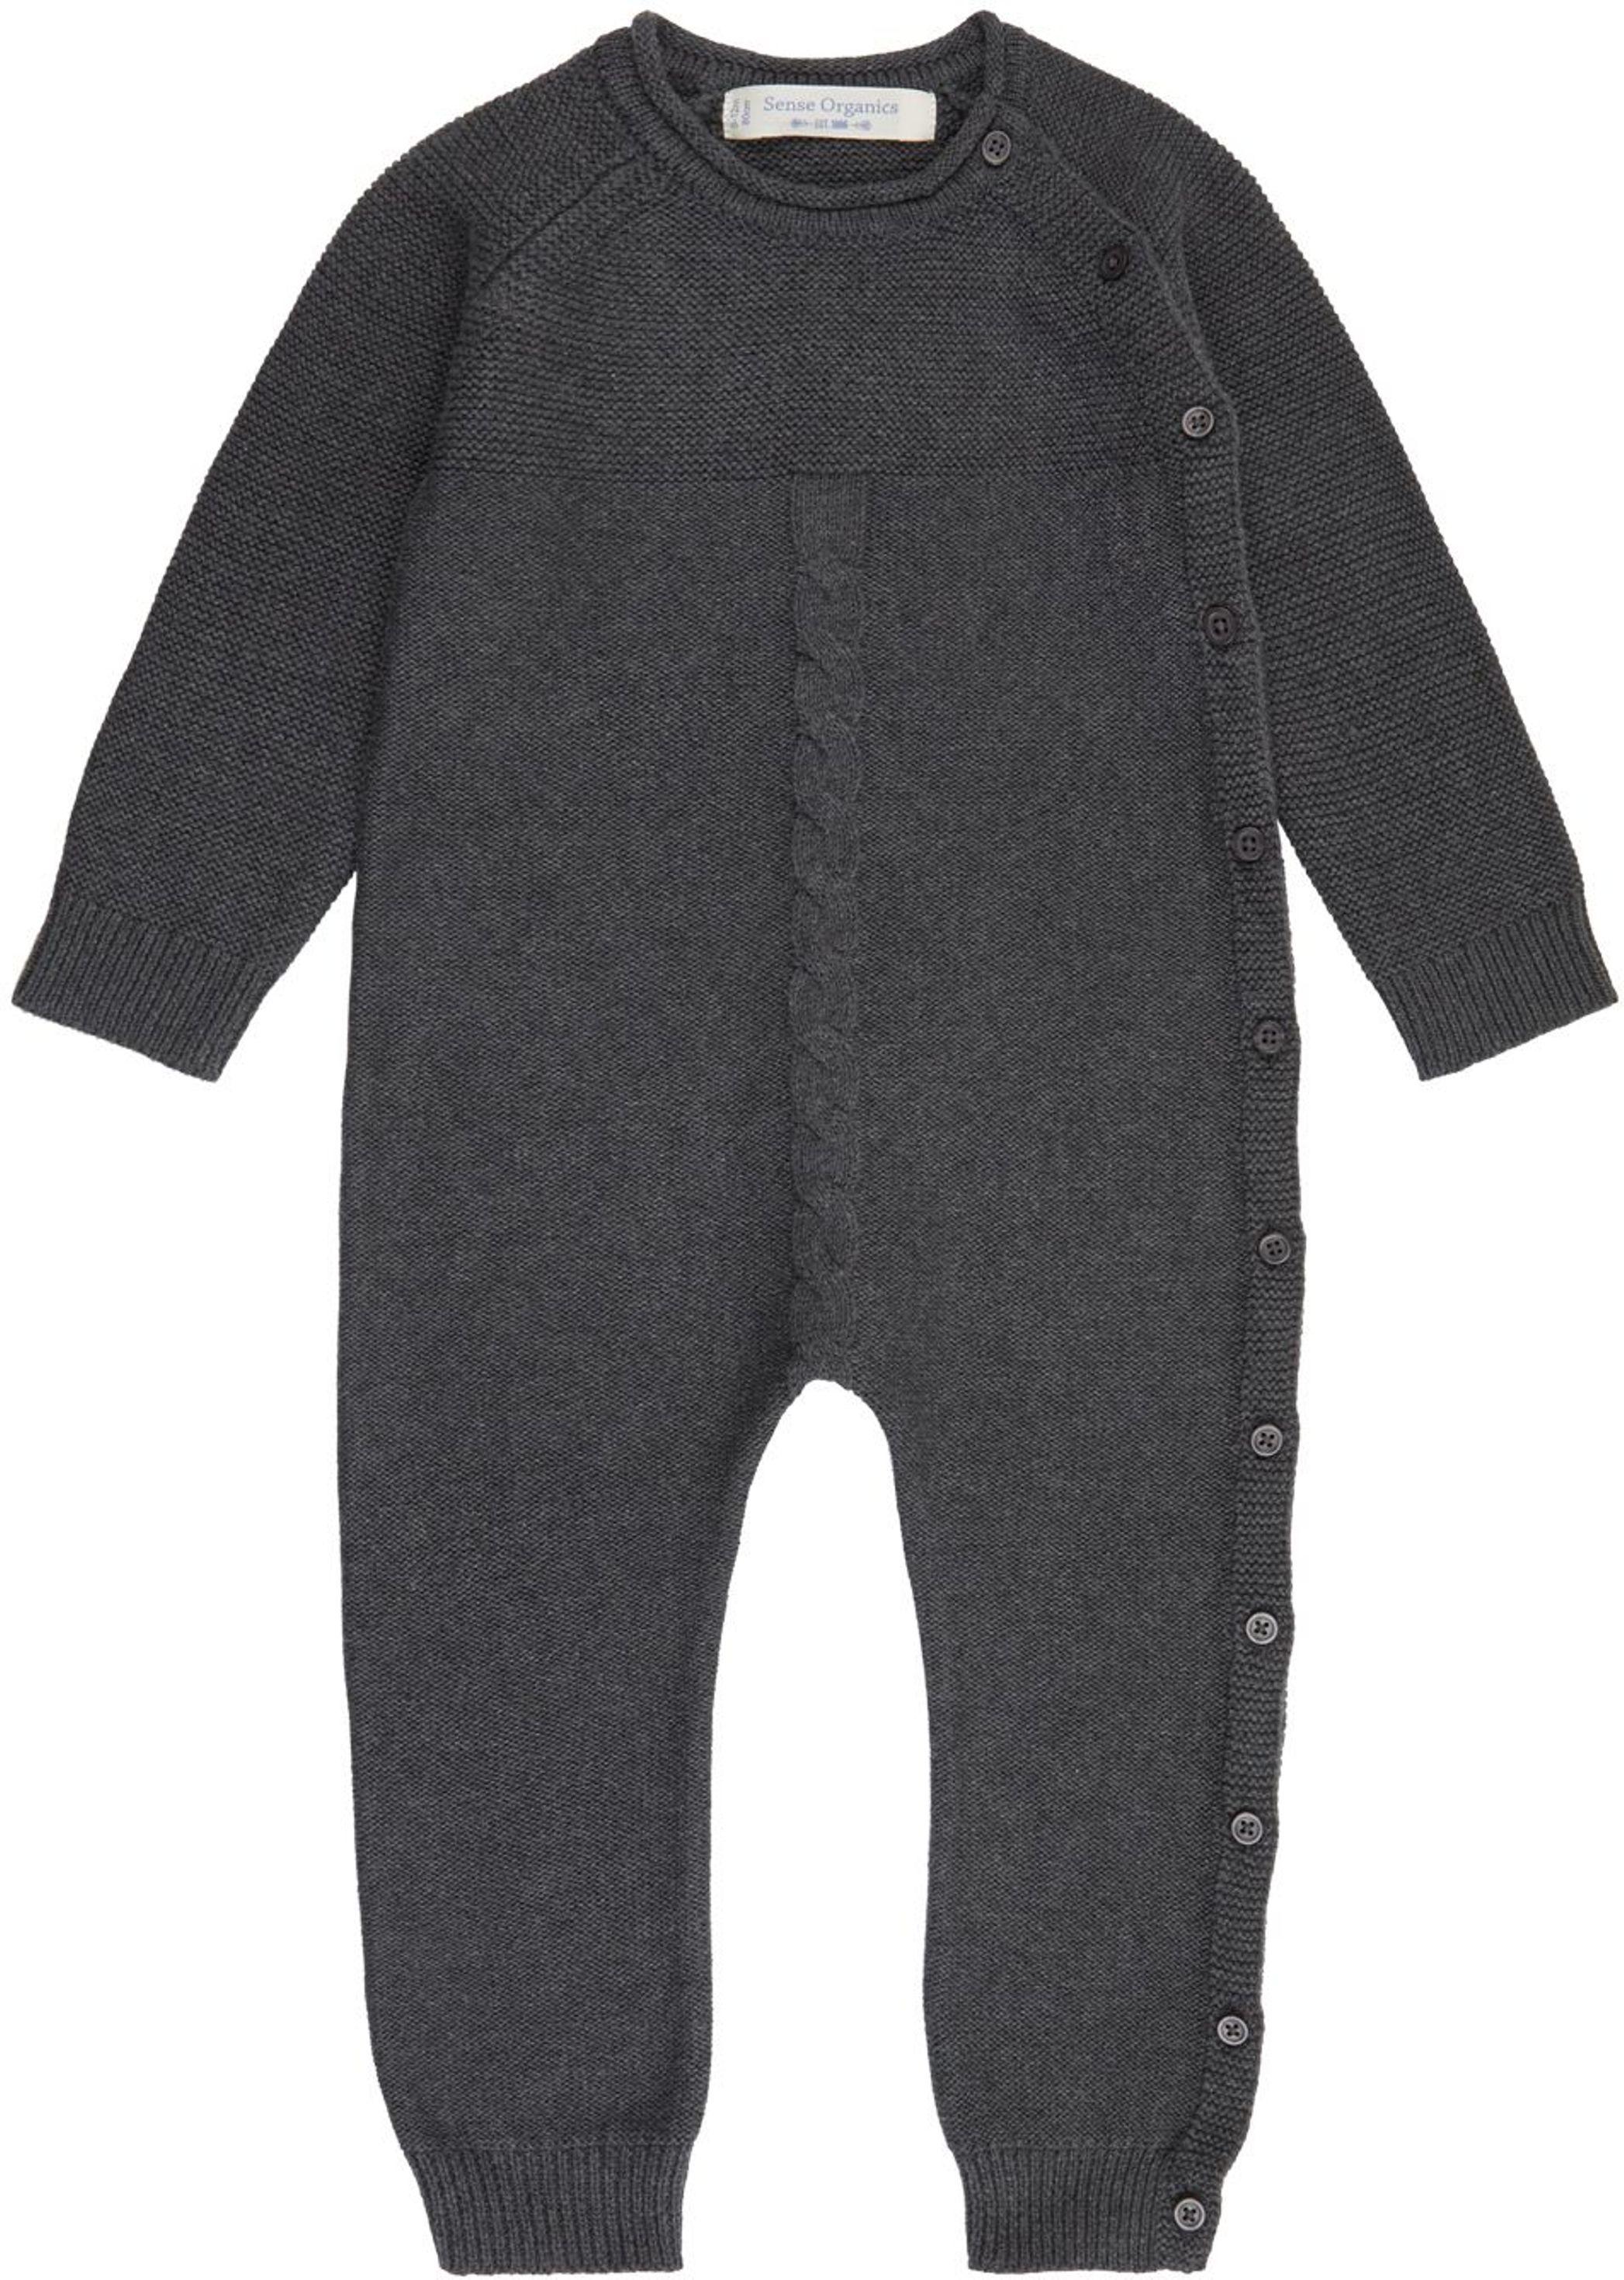 Sense Organic YACI Baby Knitted Romper anthracite